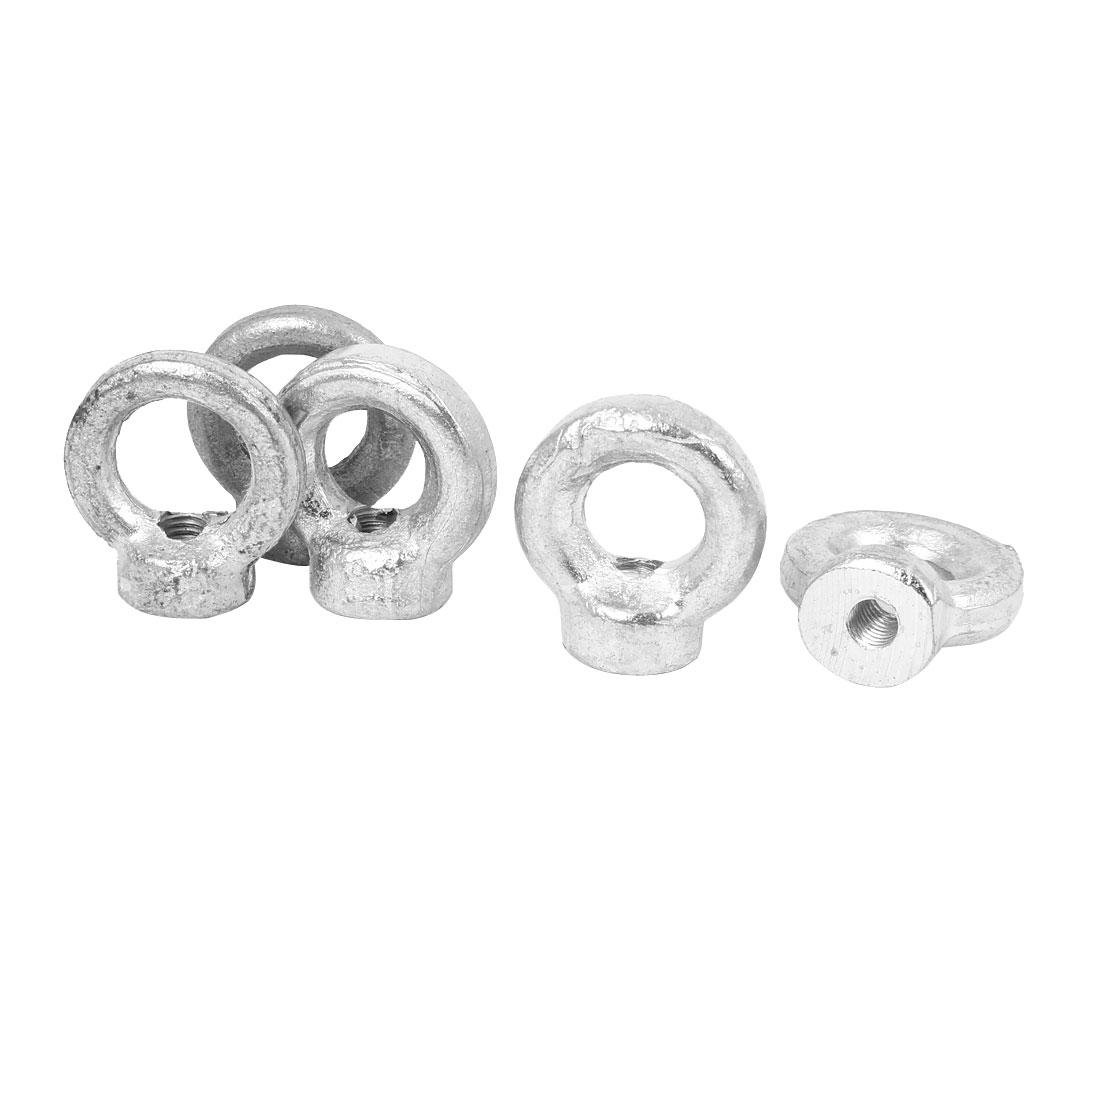 M6 Female Thread Carbon Steel Lifting Eye Nuts Rings Bolts Fastener 5 Pcs